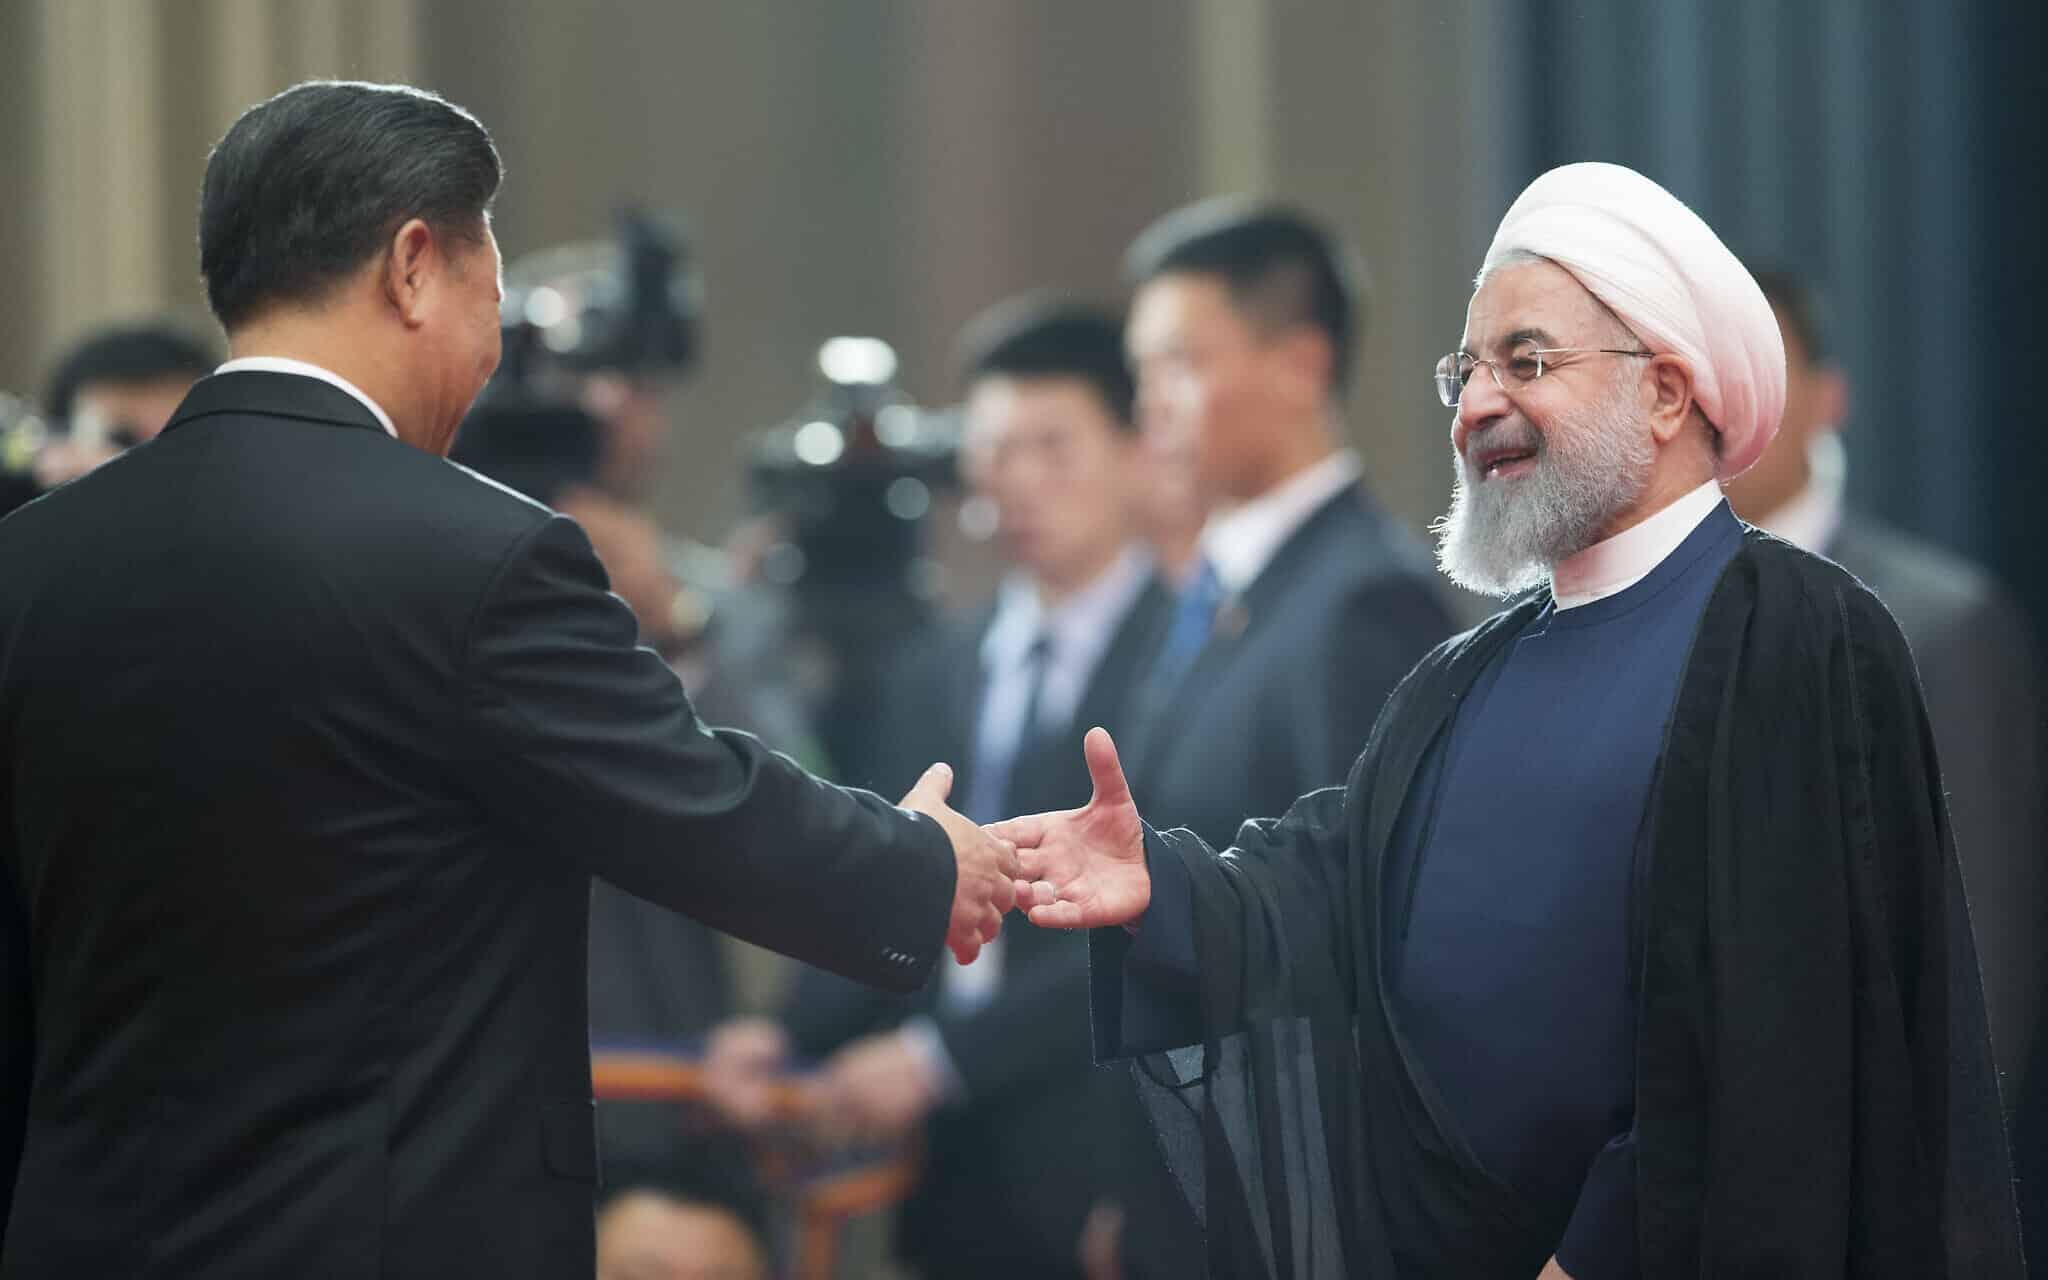 Xi Jinping and Hassan Rouhani